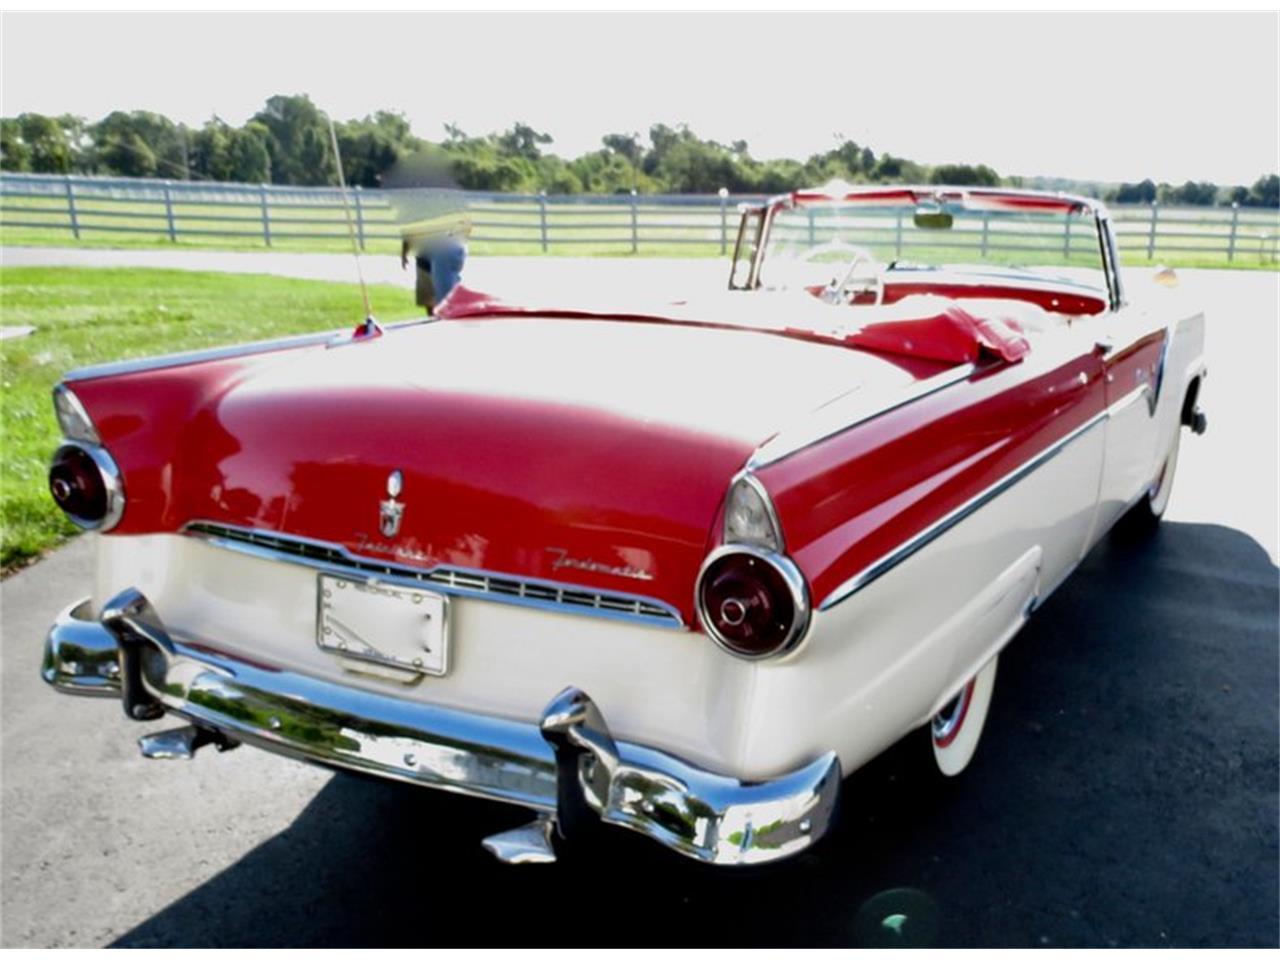 Large Picture of Classic '55 Ford Fairlane located in Dayton Ohio - $38,500.00 - QU8Q